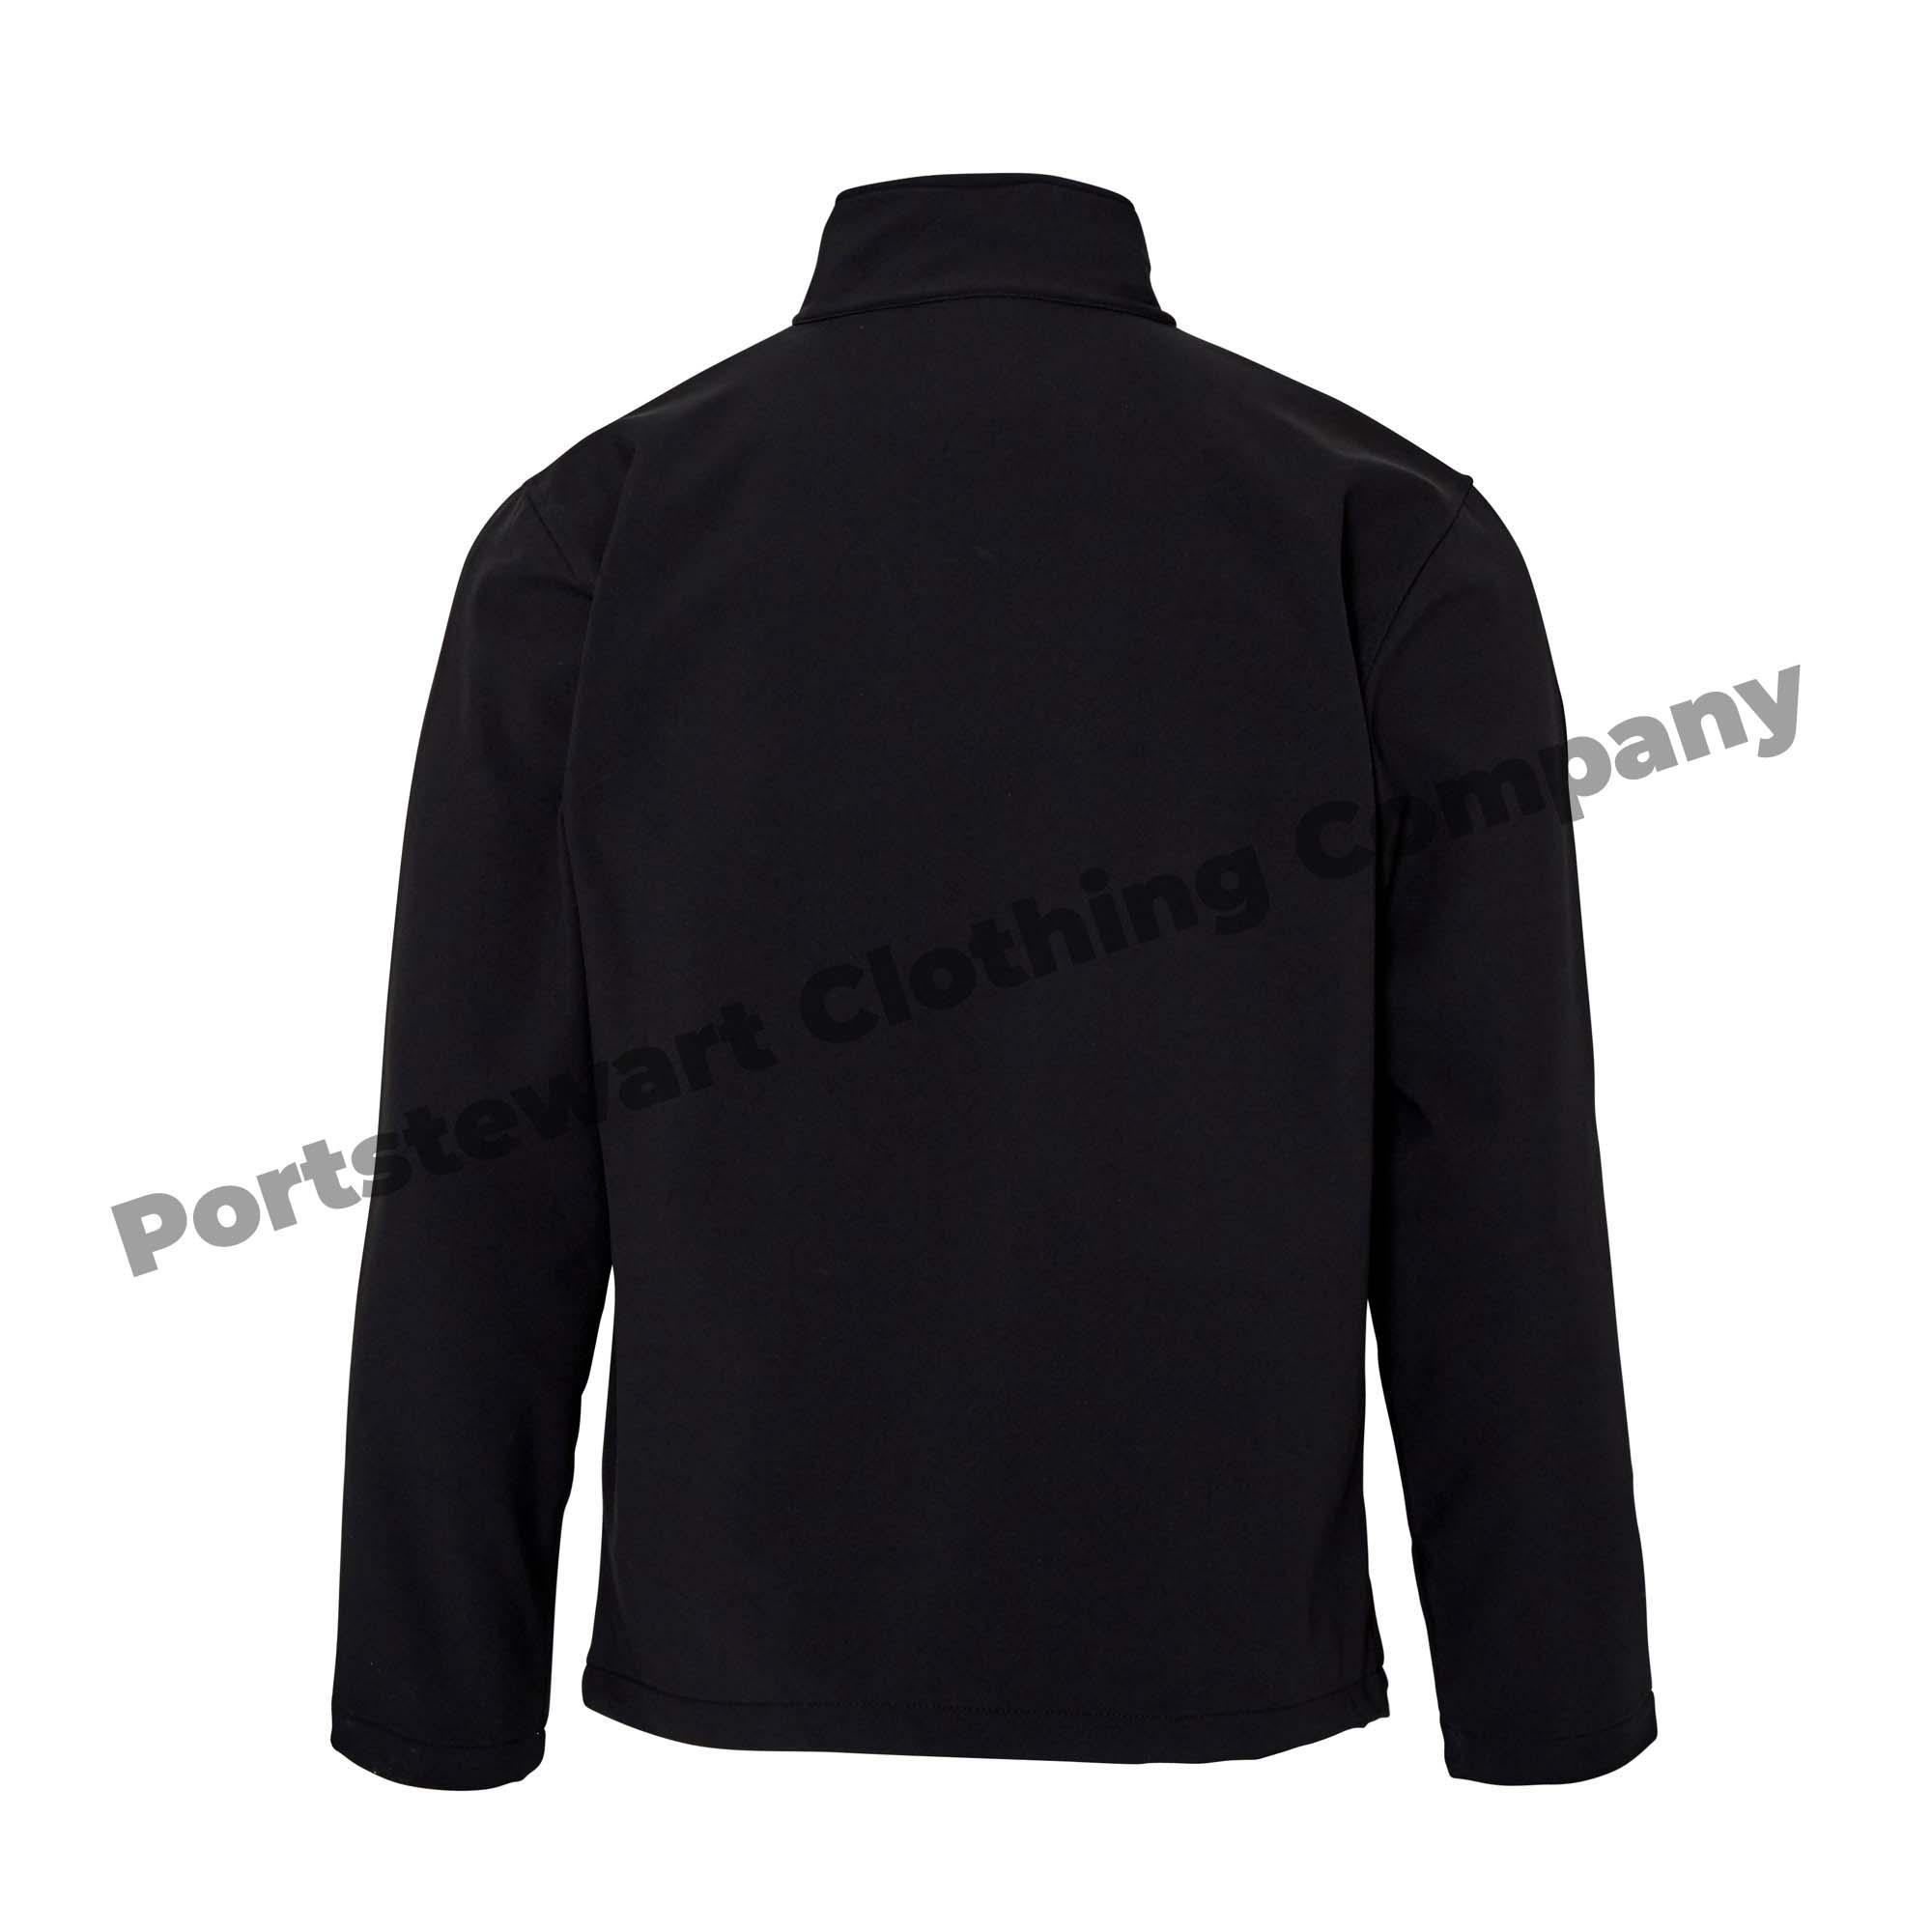 Regatta-Mens-Soft-Shell-Windproof-Workwear-Softshell-Jacket-Coat-RRP-50 thumbnail 3